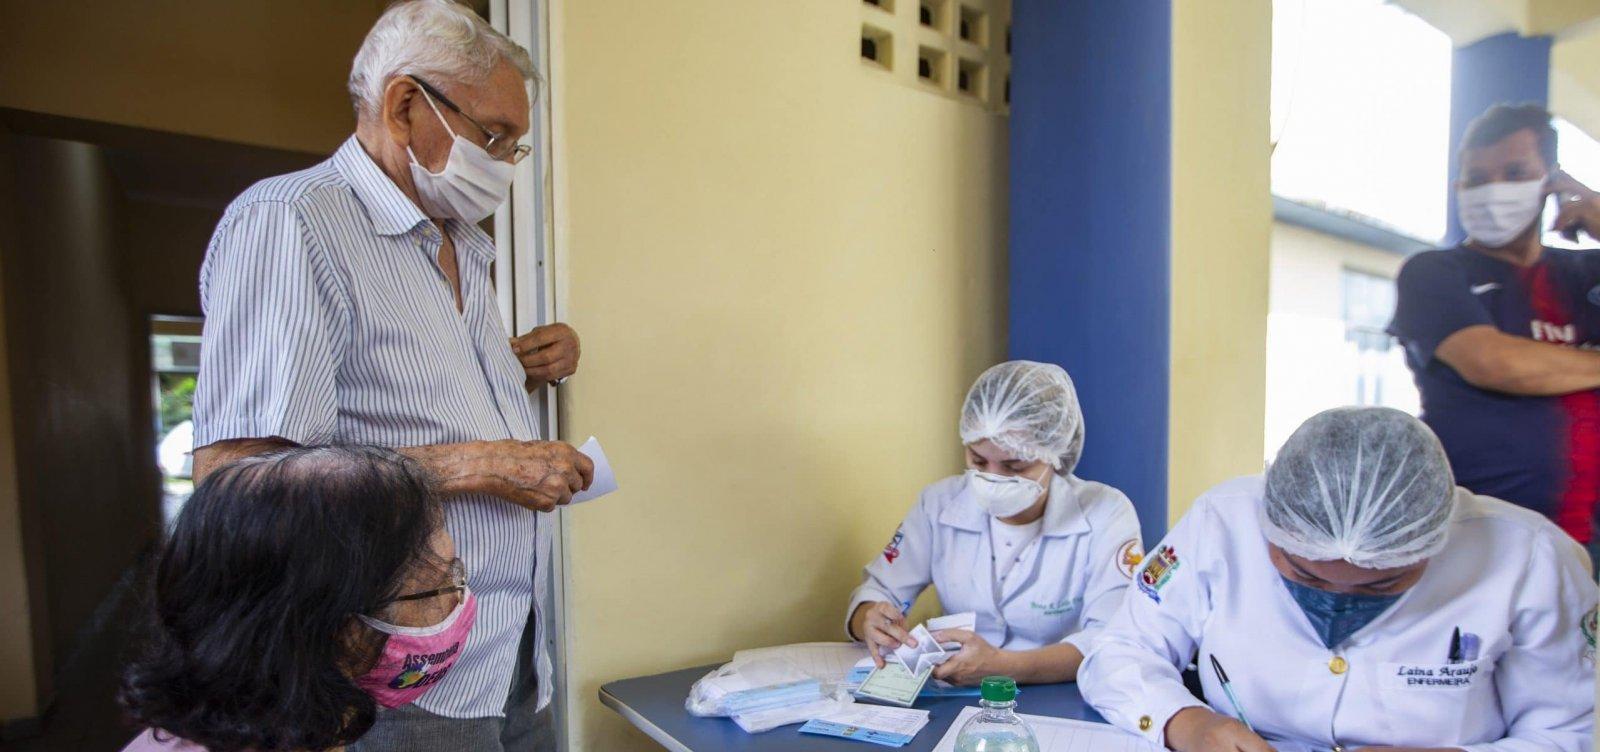 Bahia pode começar a vacinar idosos acima de 80 anos nesta segunda-feira